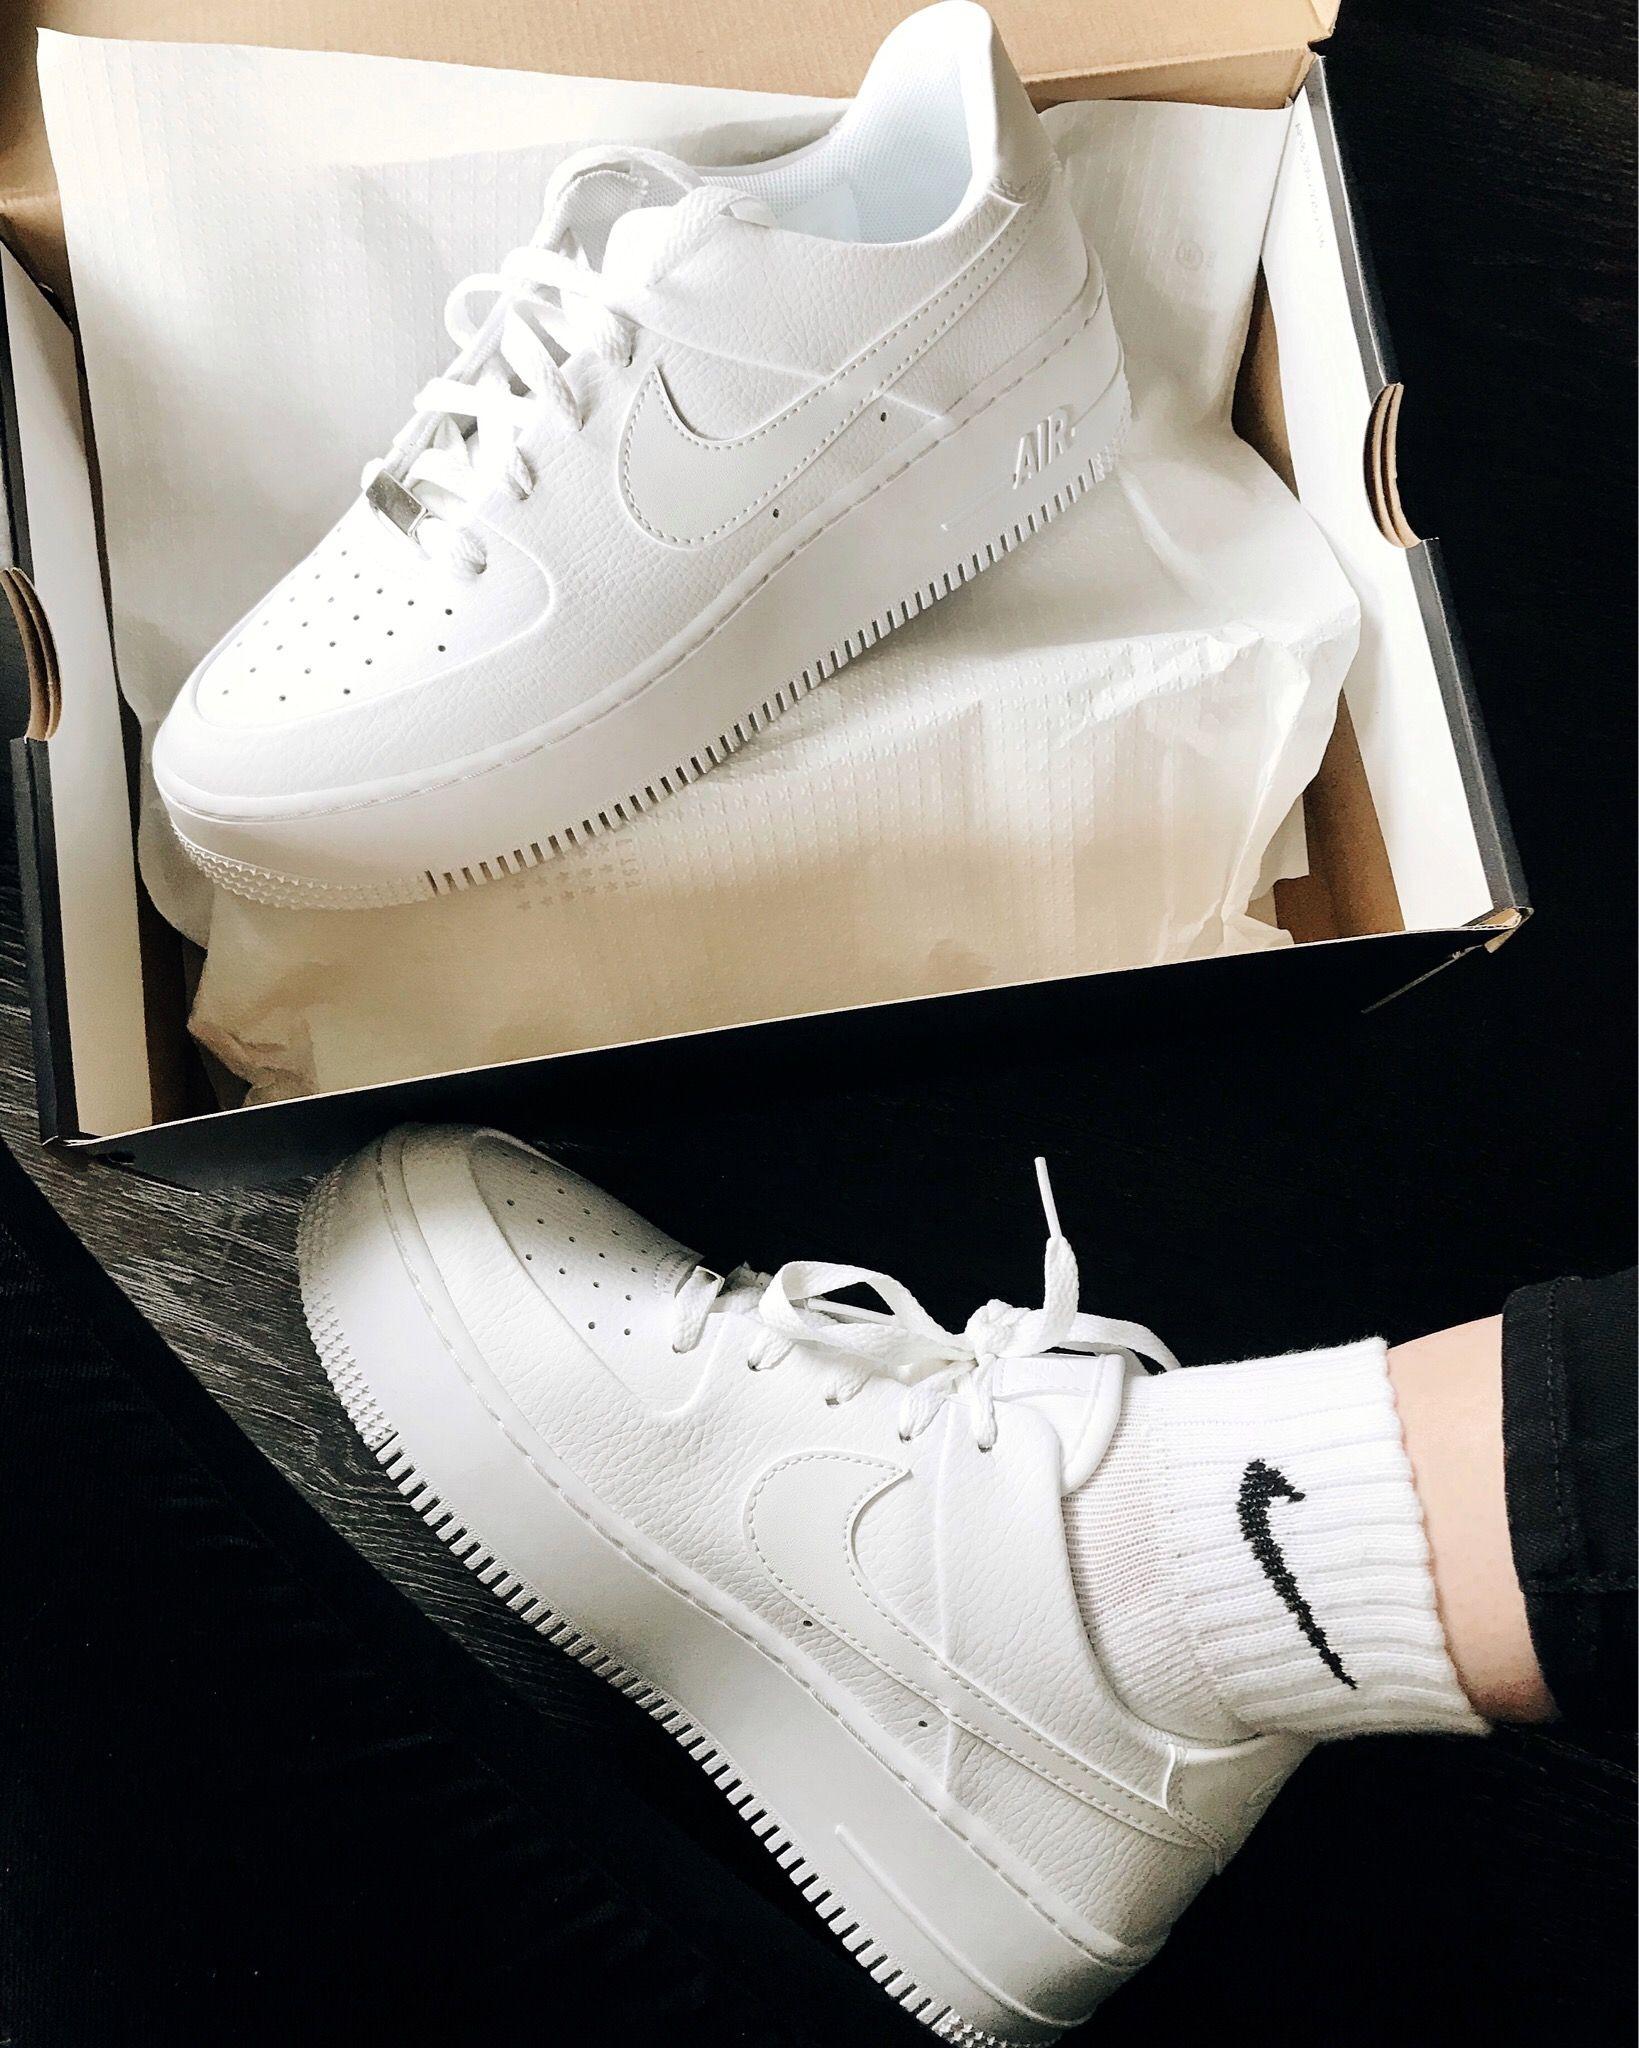 Nike Air Force 1 Sage | Nike socks